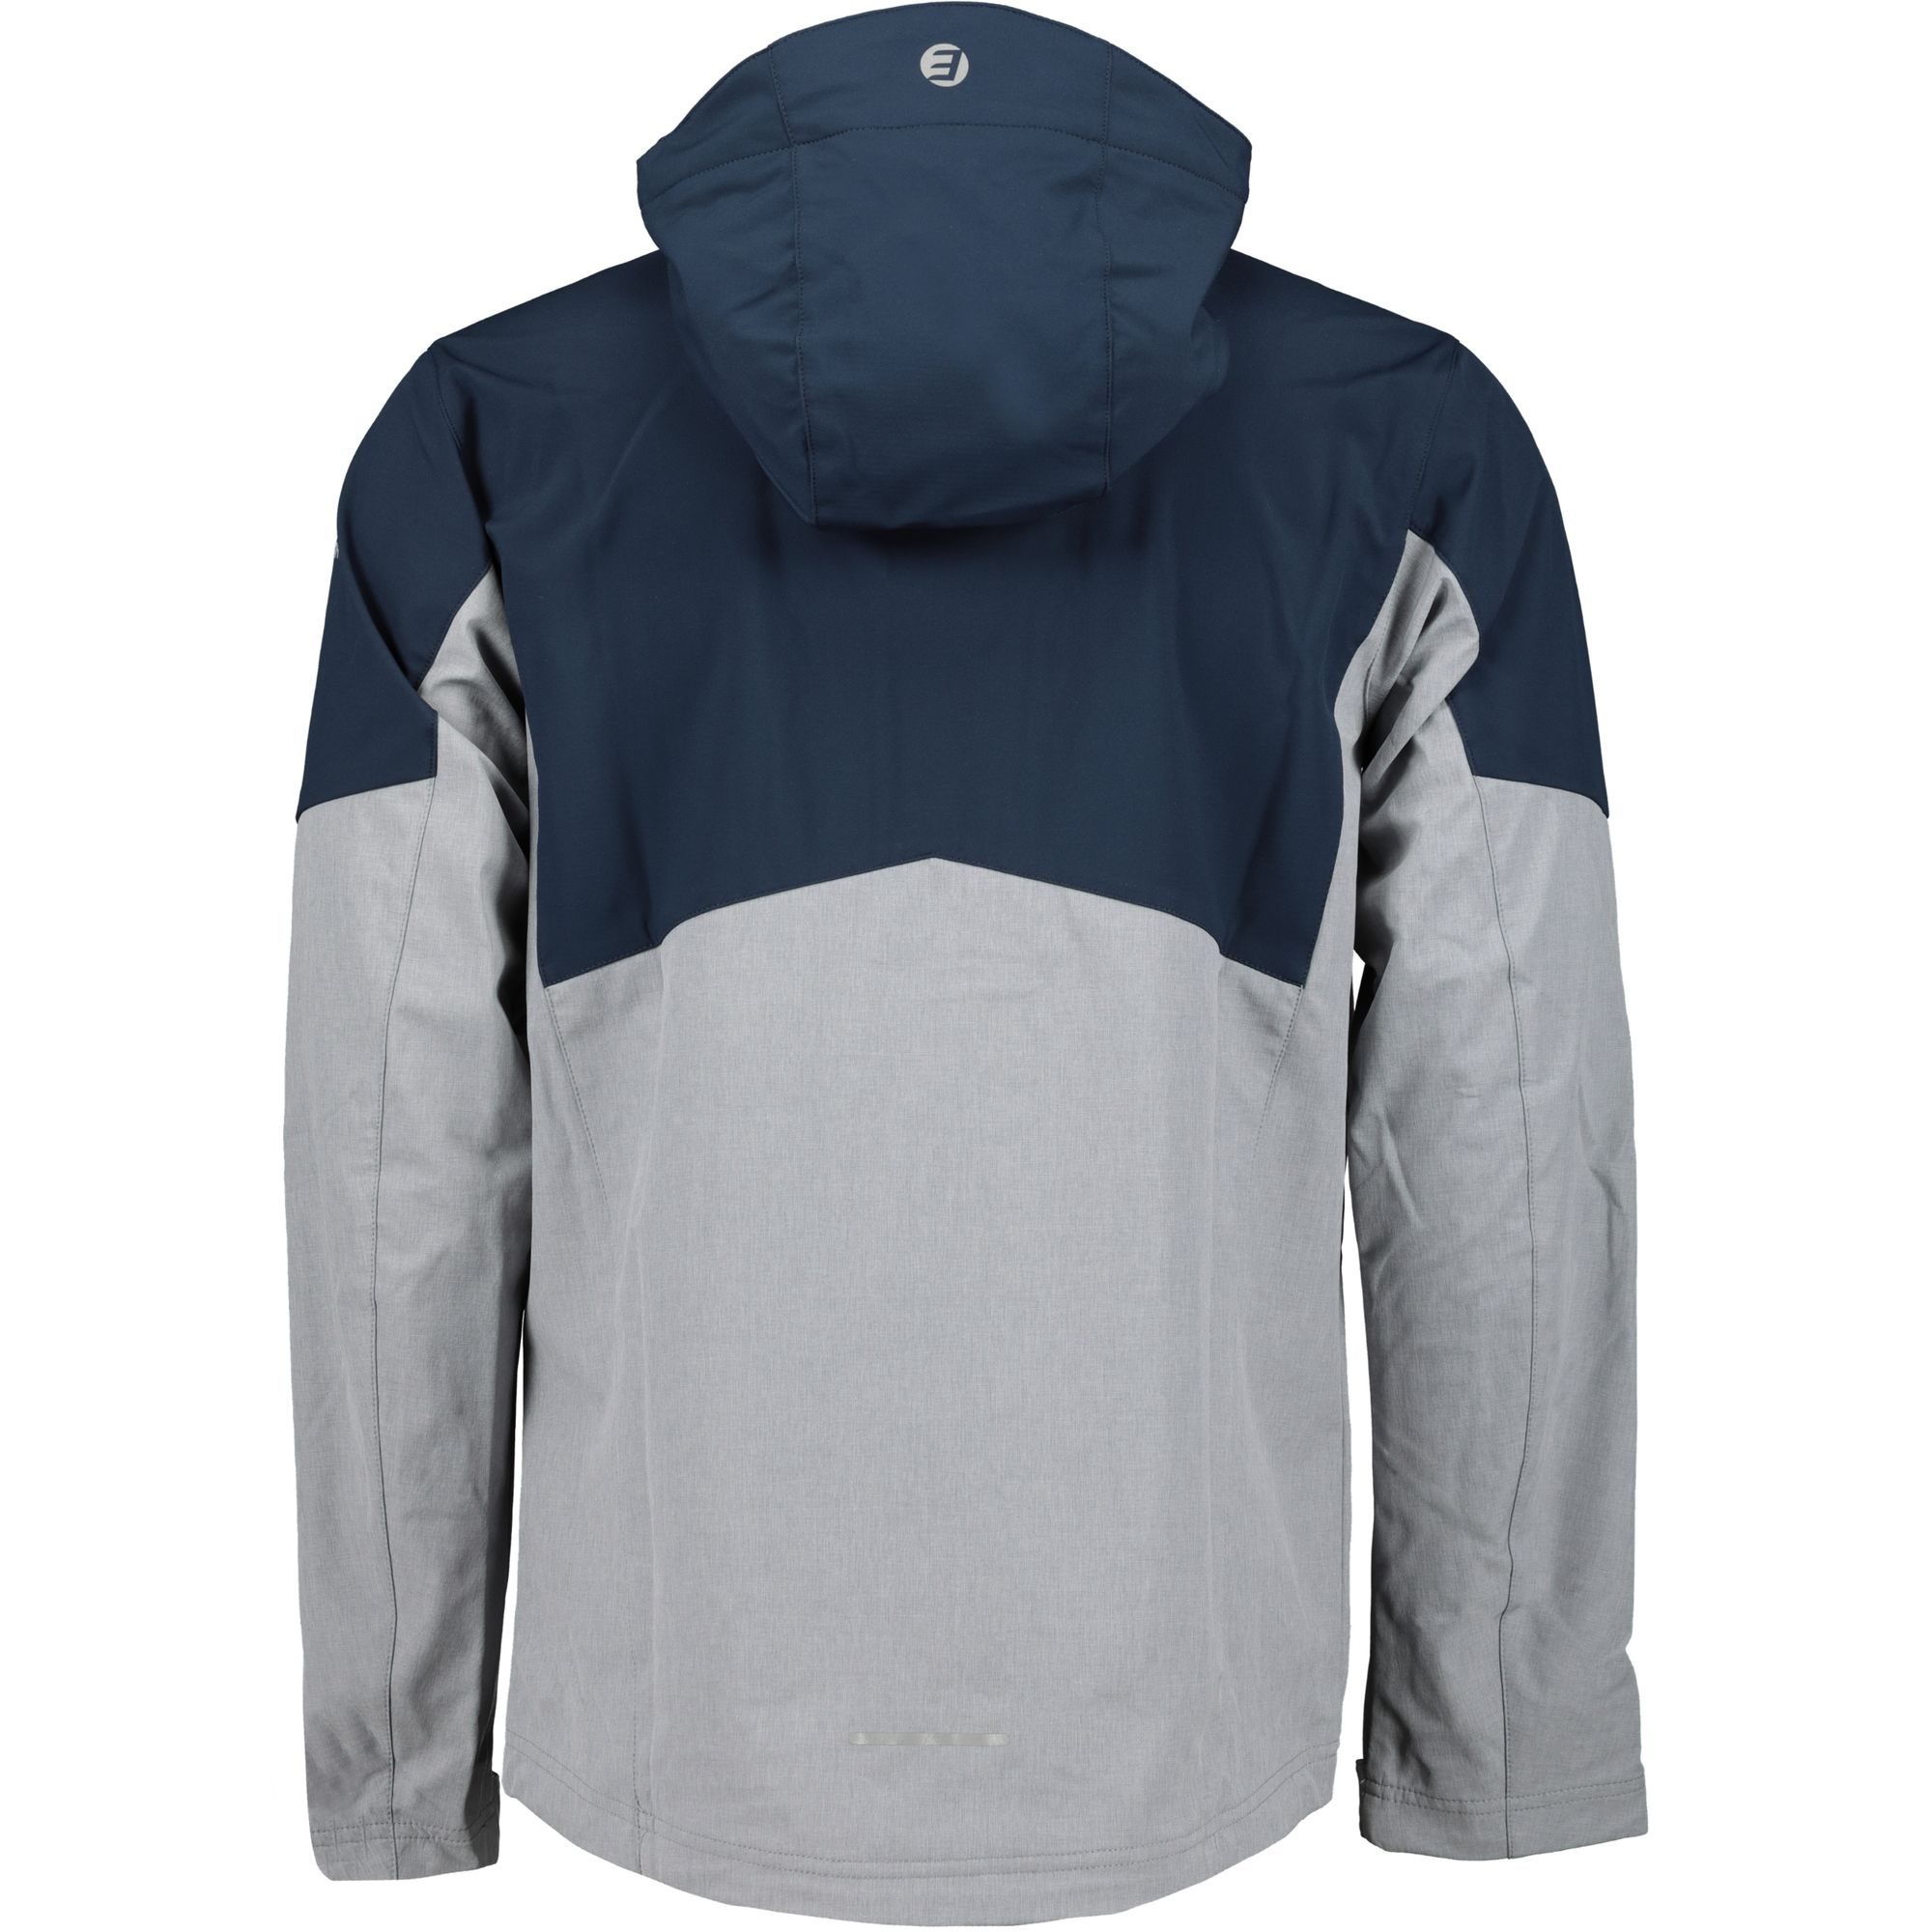 Title About Show Navy Mens Icepeak Saxon Jacket Softshell Blue Original Details 1JclFK